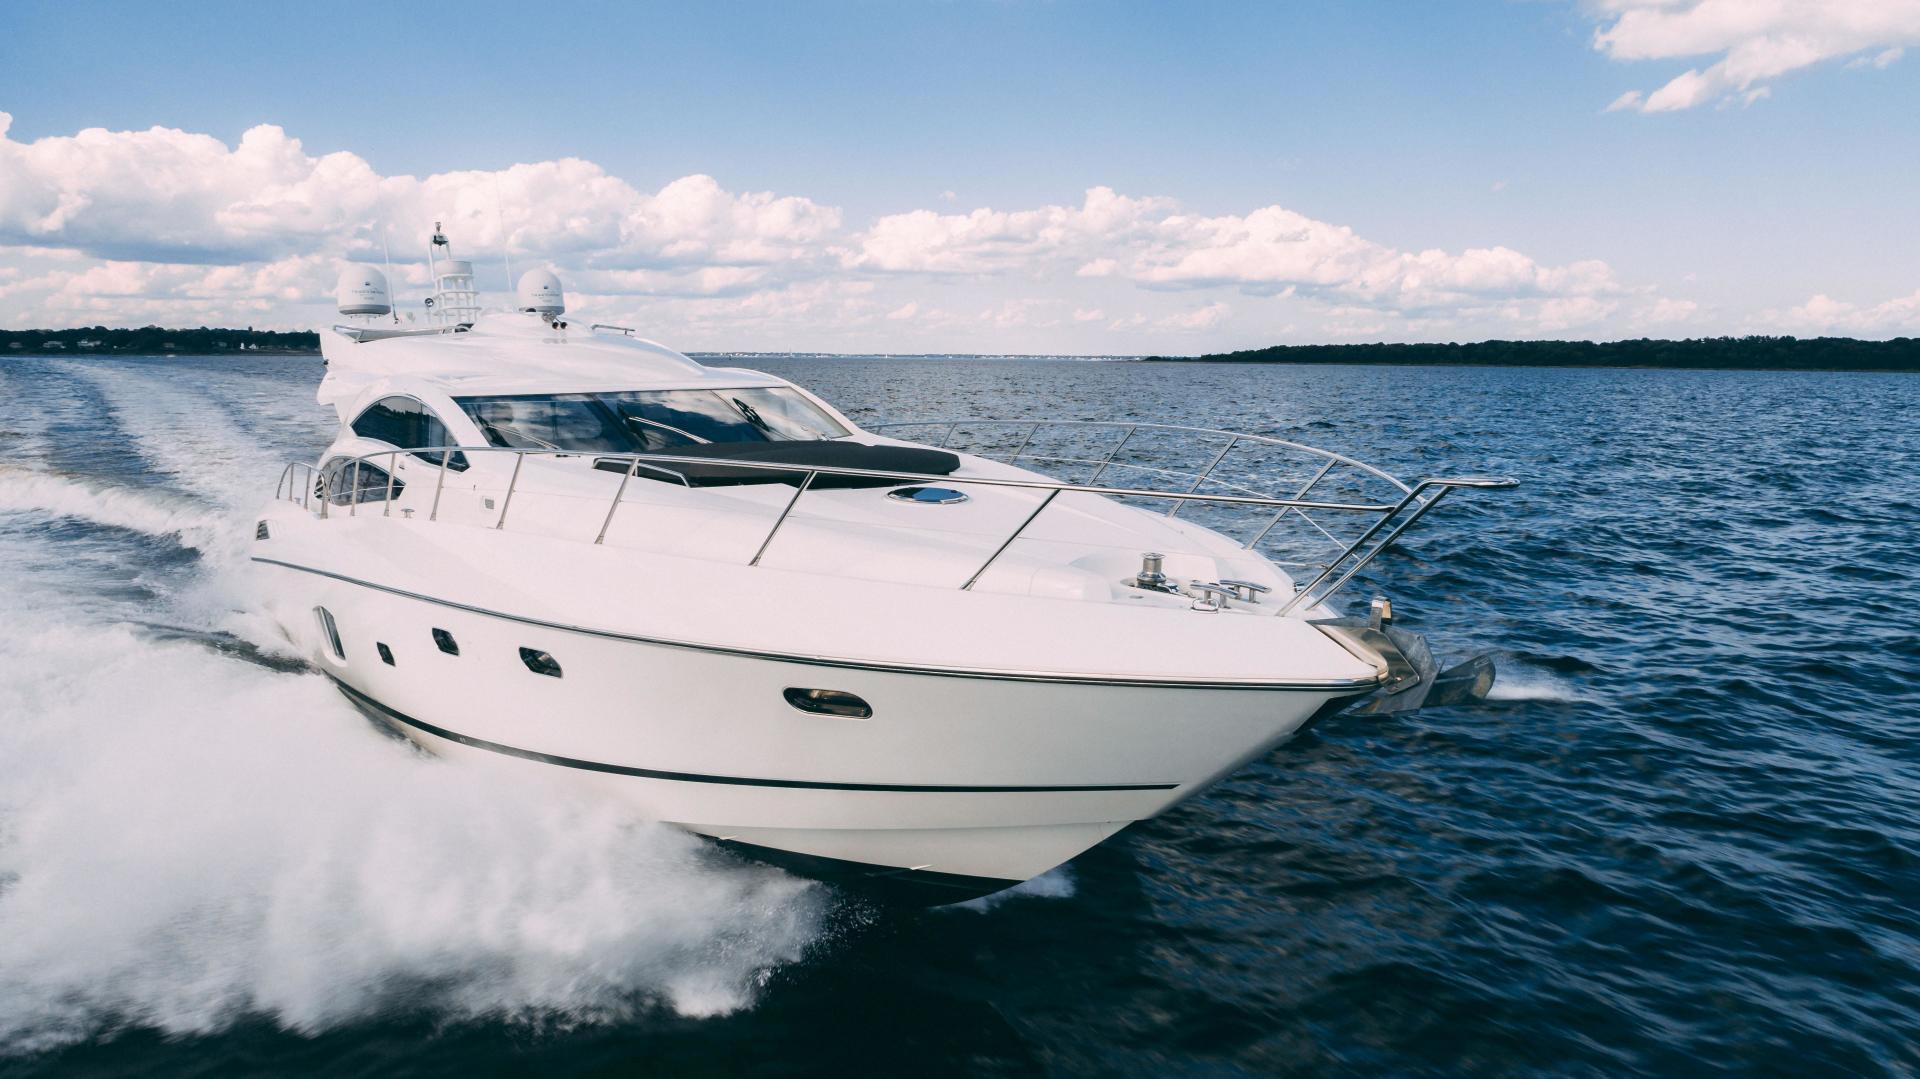 Sunseeker-Motor yacht 2012-JIMBO New Port-Rhode Island-United States-1480127 | Thumbnail